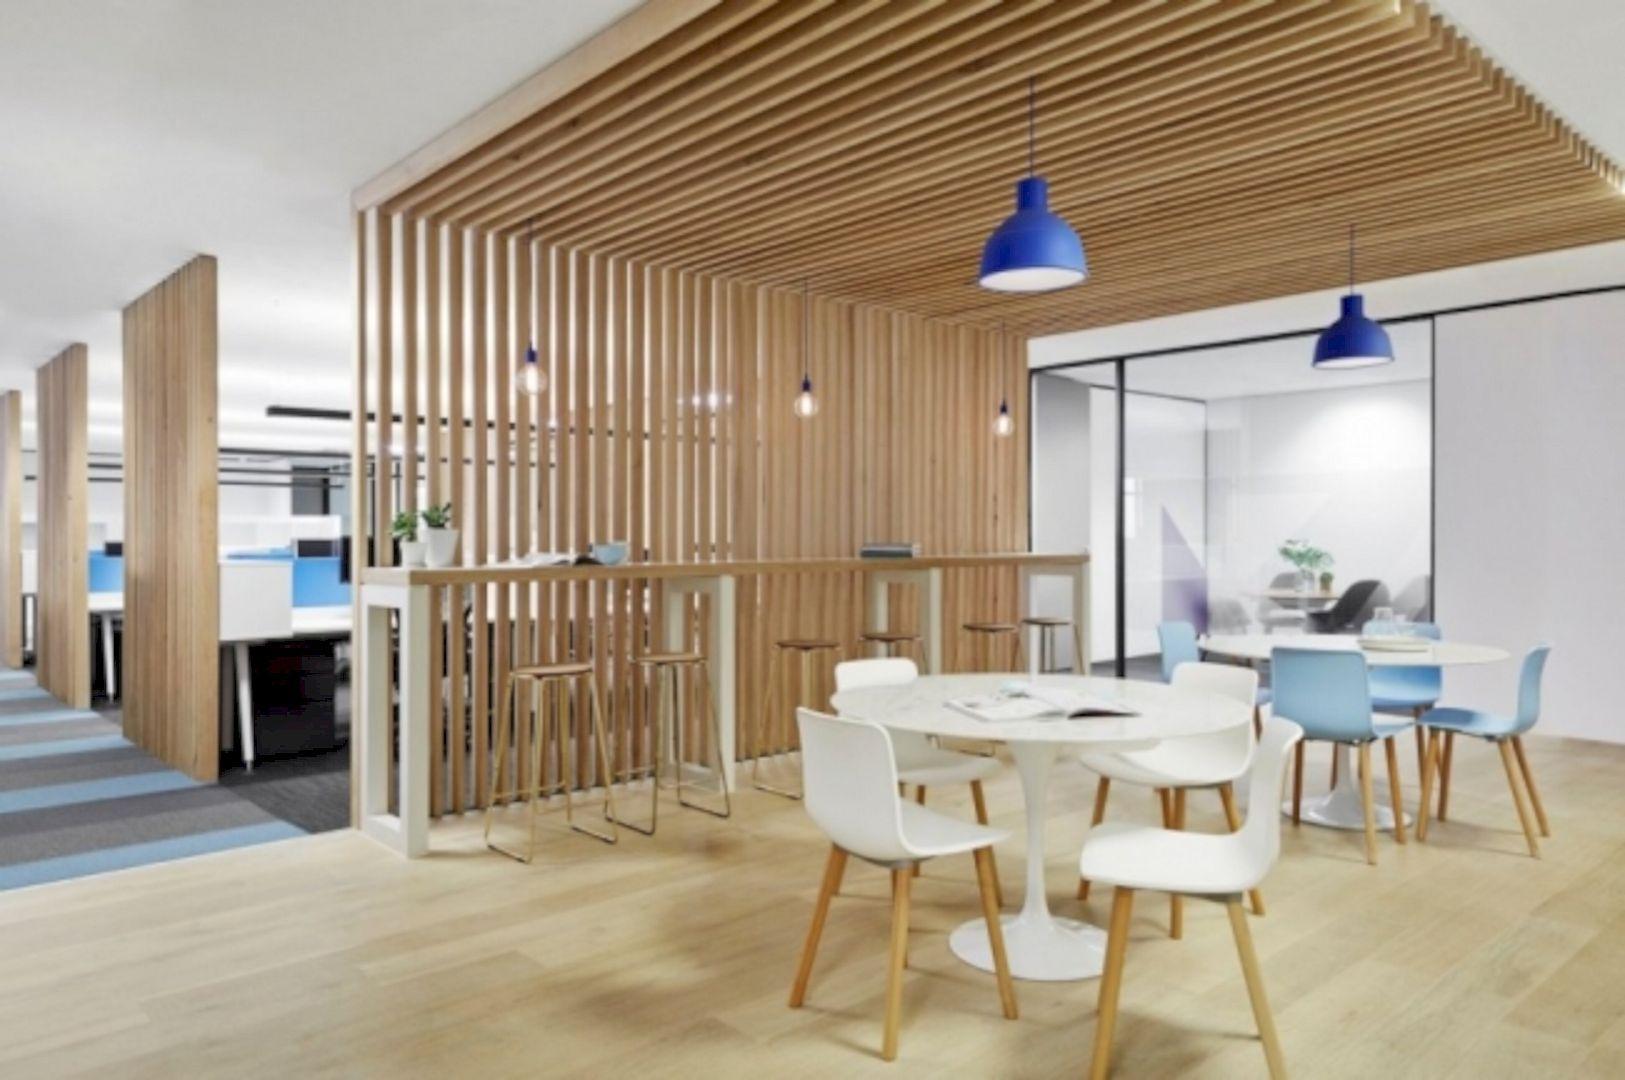 Office Interior A Contemporary Modern Workspace Of The Design Studio Office Interior Design Office Space Design Office Design